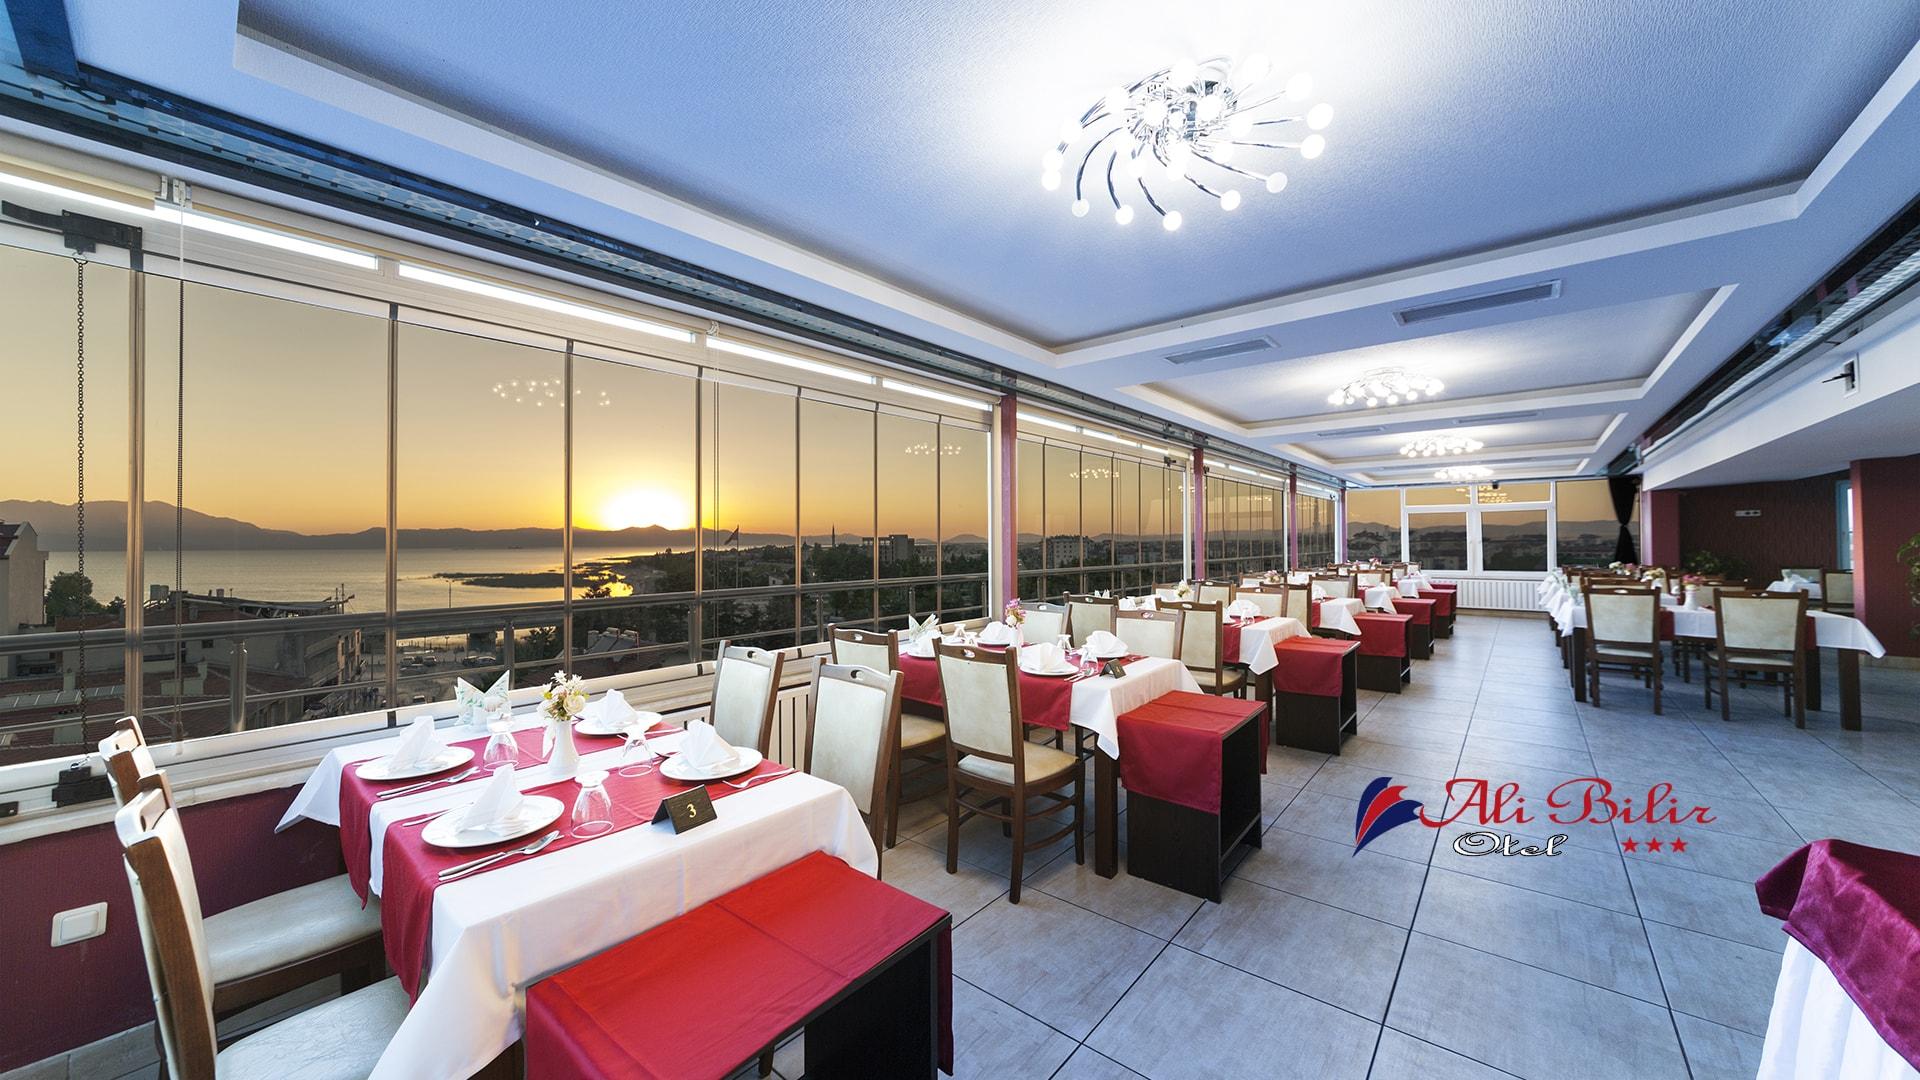 Ali Bilit Otel & Restorant